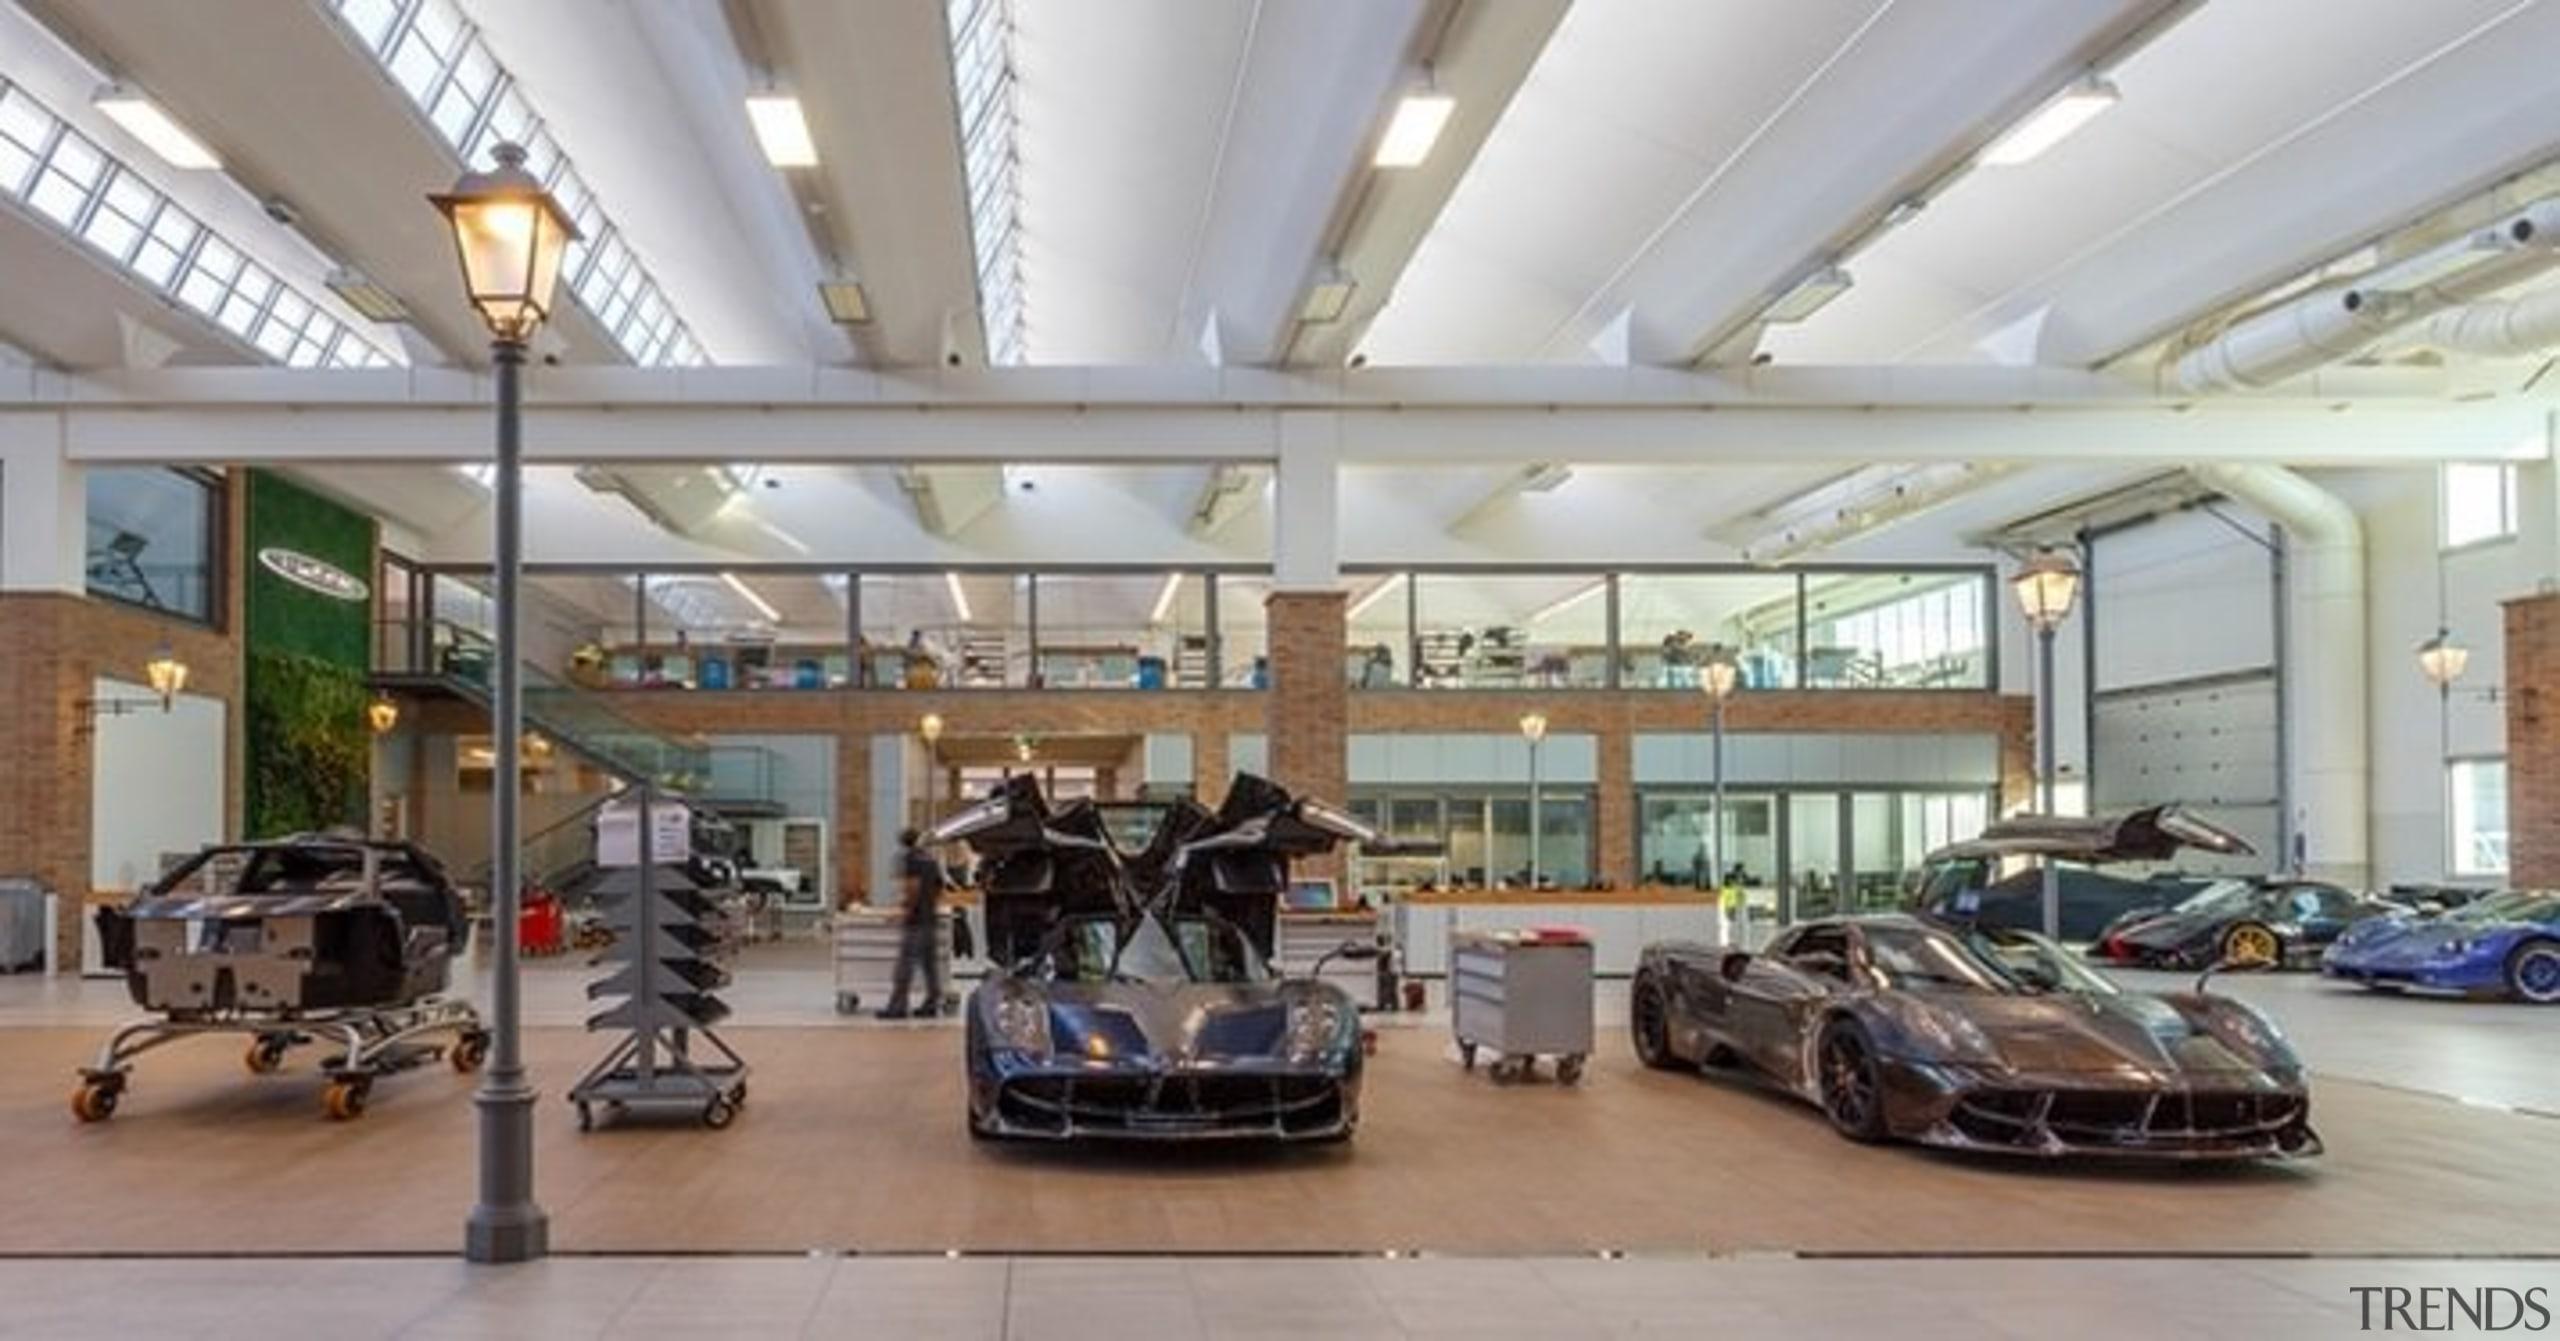 Learn more about NeriGet Neri lights automotive design, car, car dealership, motor vehicle, gray